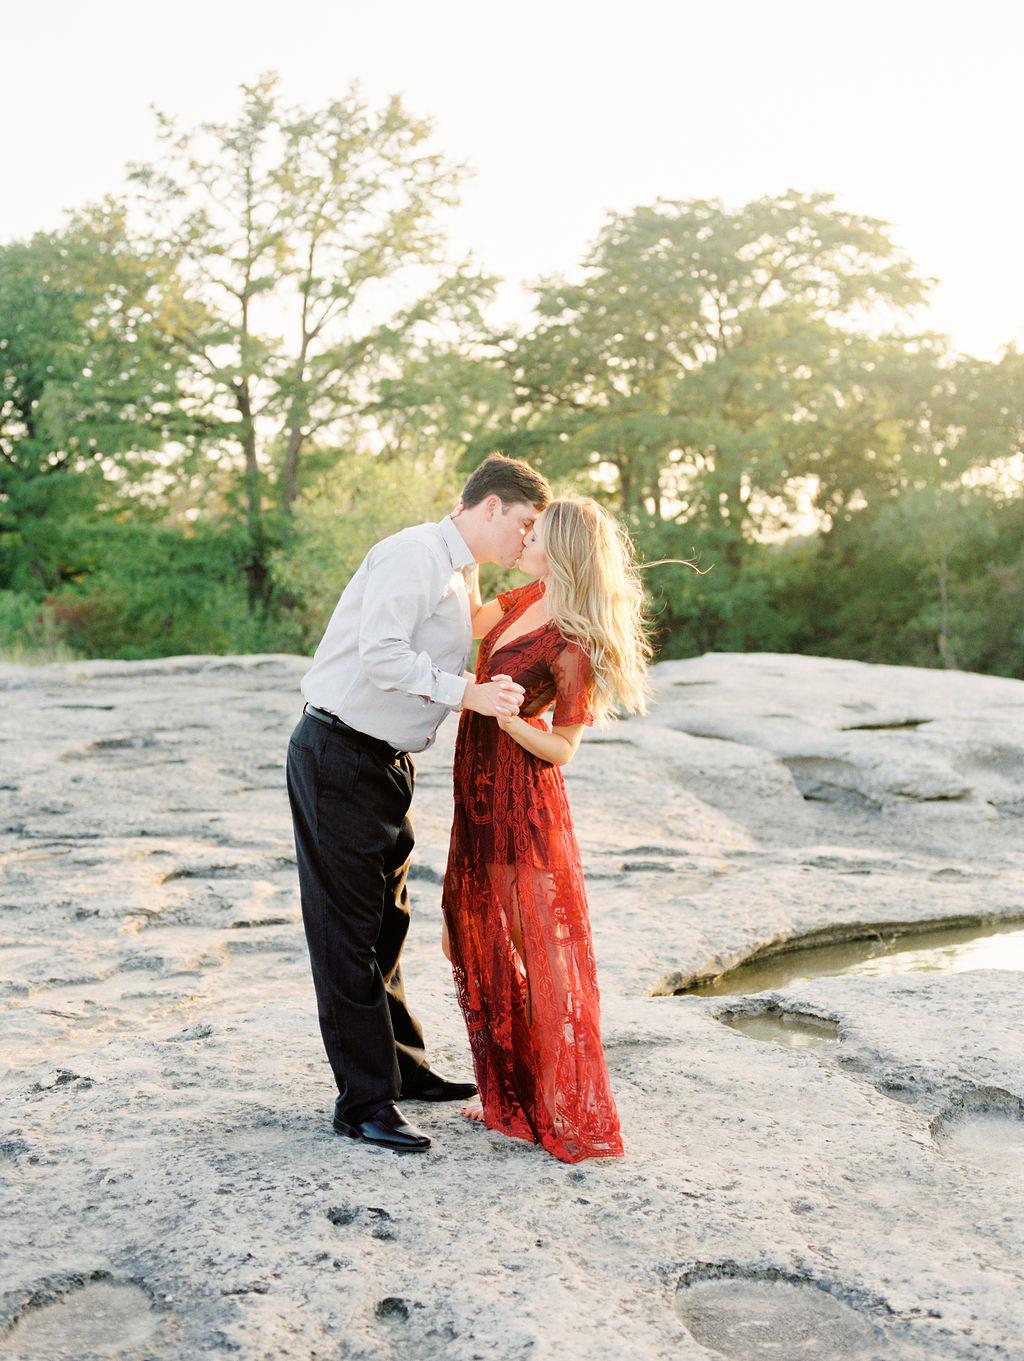 Austin-Film-Wedding-Engagement-Photographer-McKinney-Falls-25.jpg